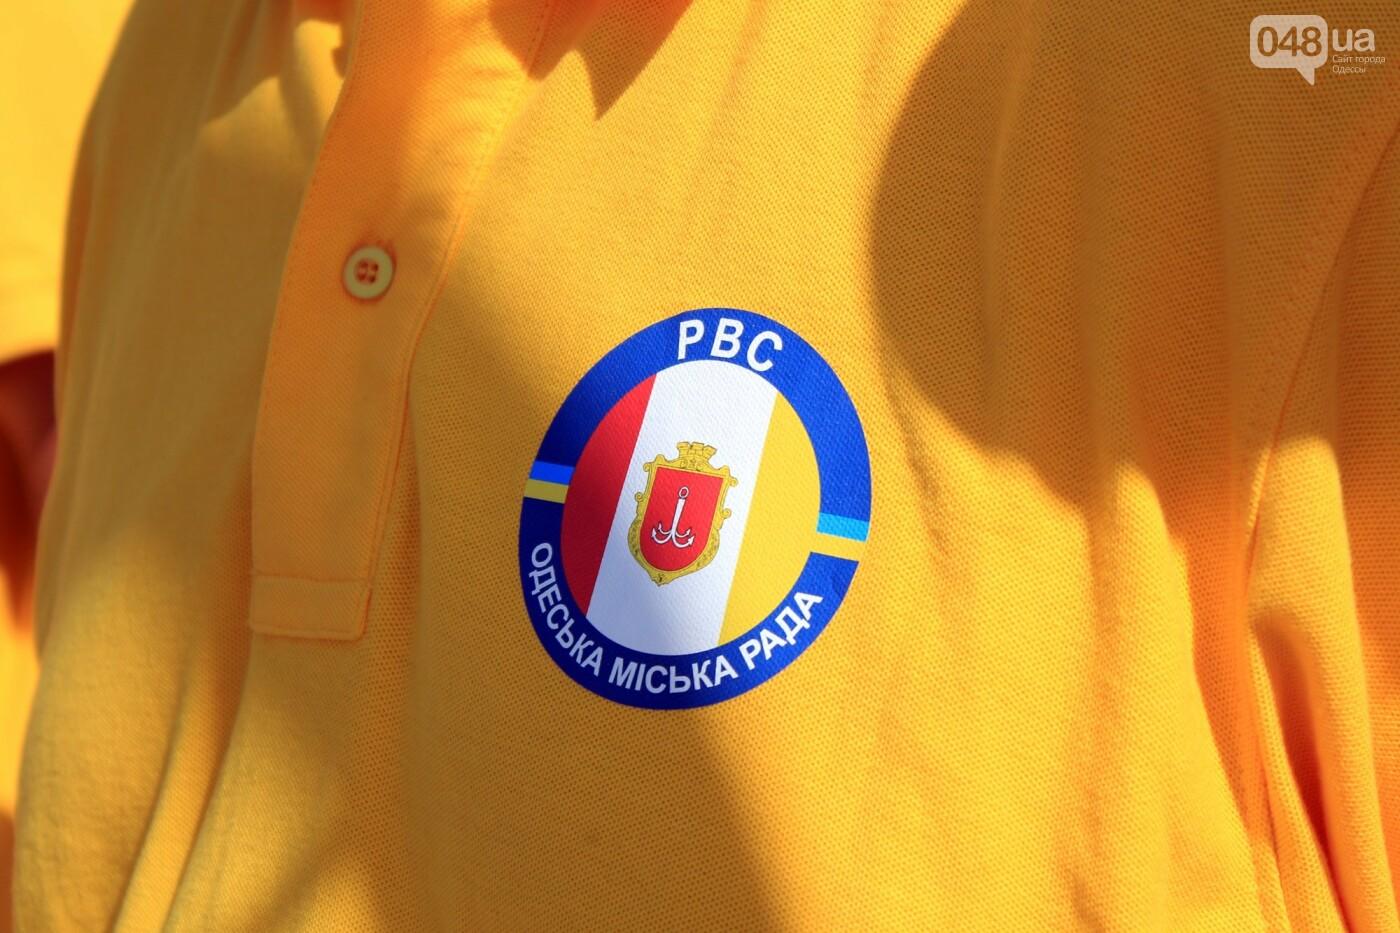 Школьники спасали утопающих: на Ланжероне в Одессе провели учения, - ФОТО, ВИДЕО , фото-24